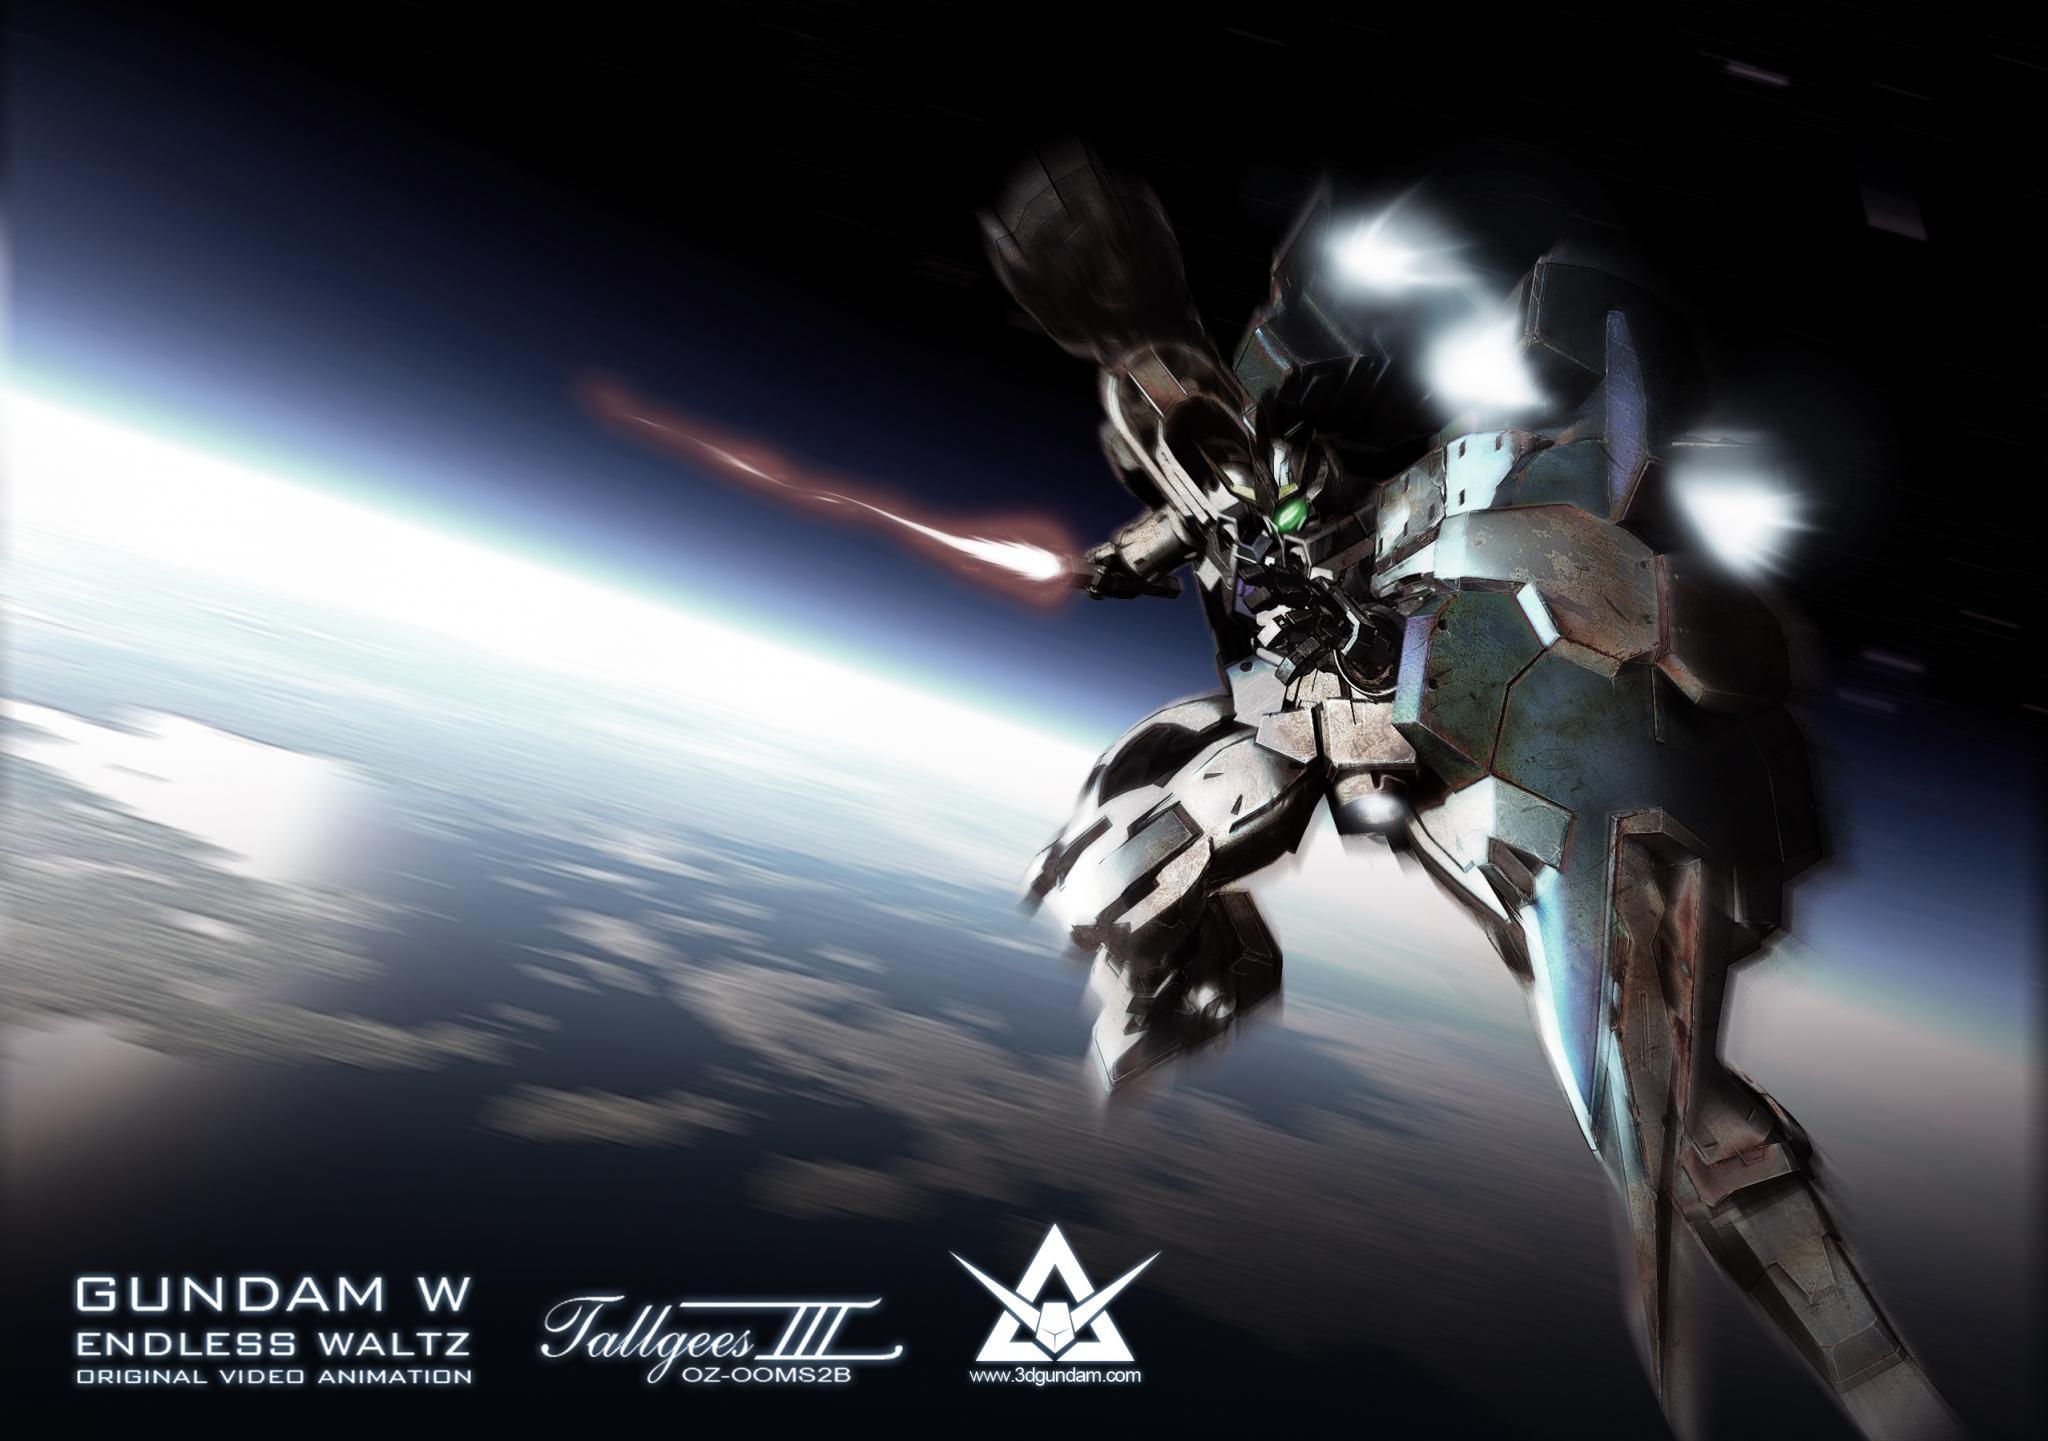 Gundam Barbatos Wallpaper Download Free Cool Full Hd